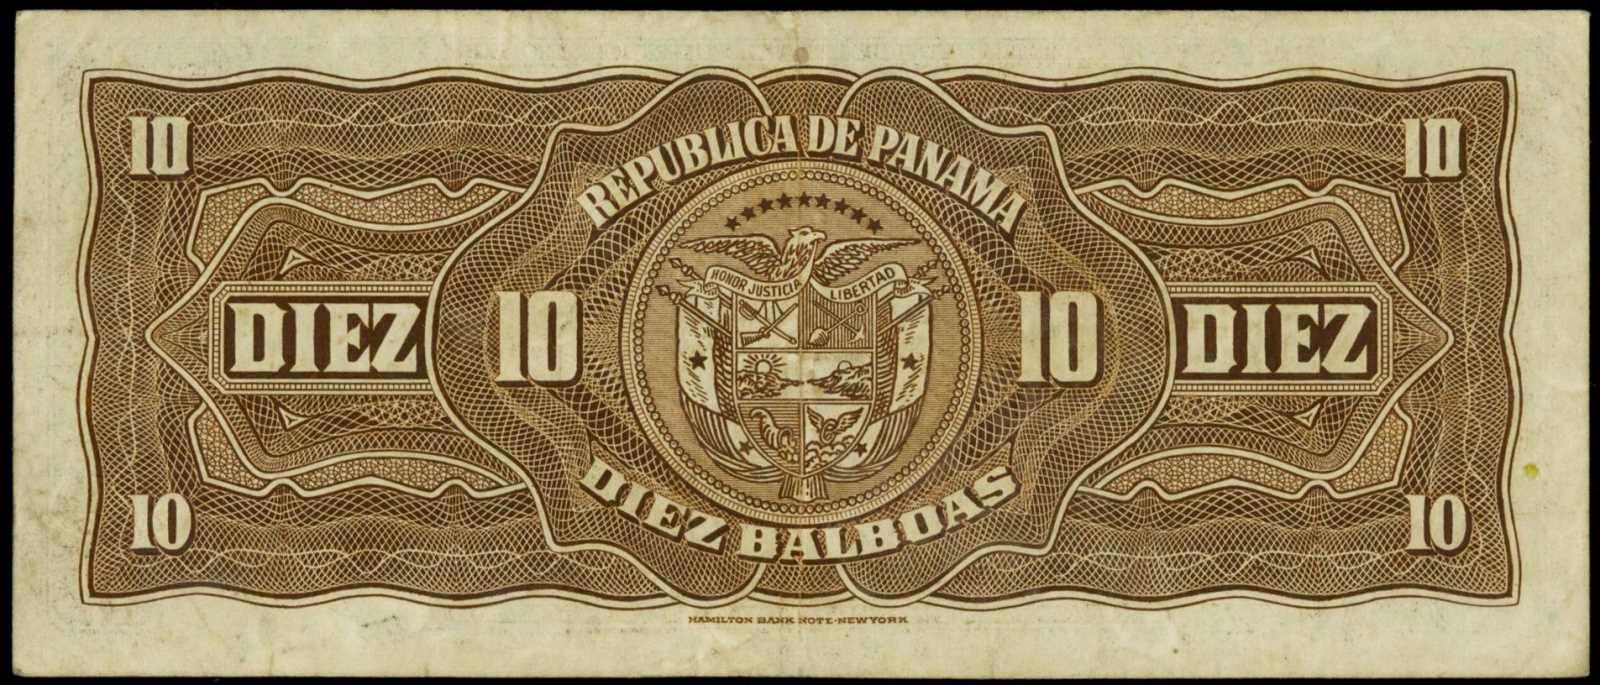 Republica de Panama currency 10 Balboas